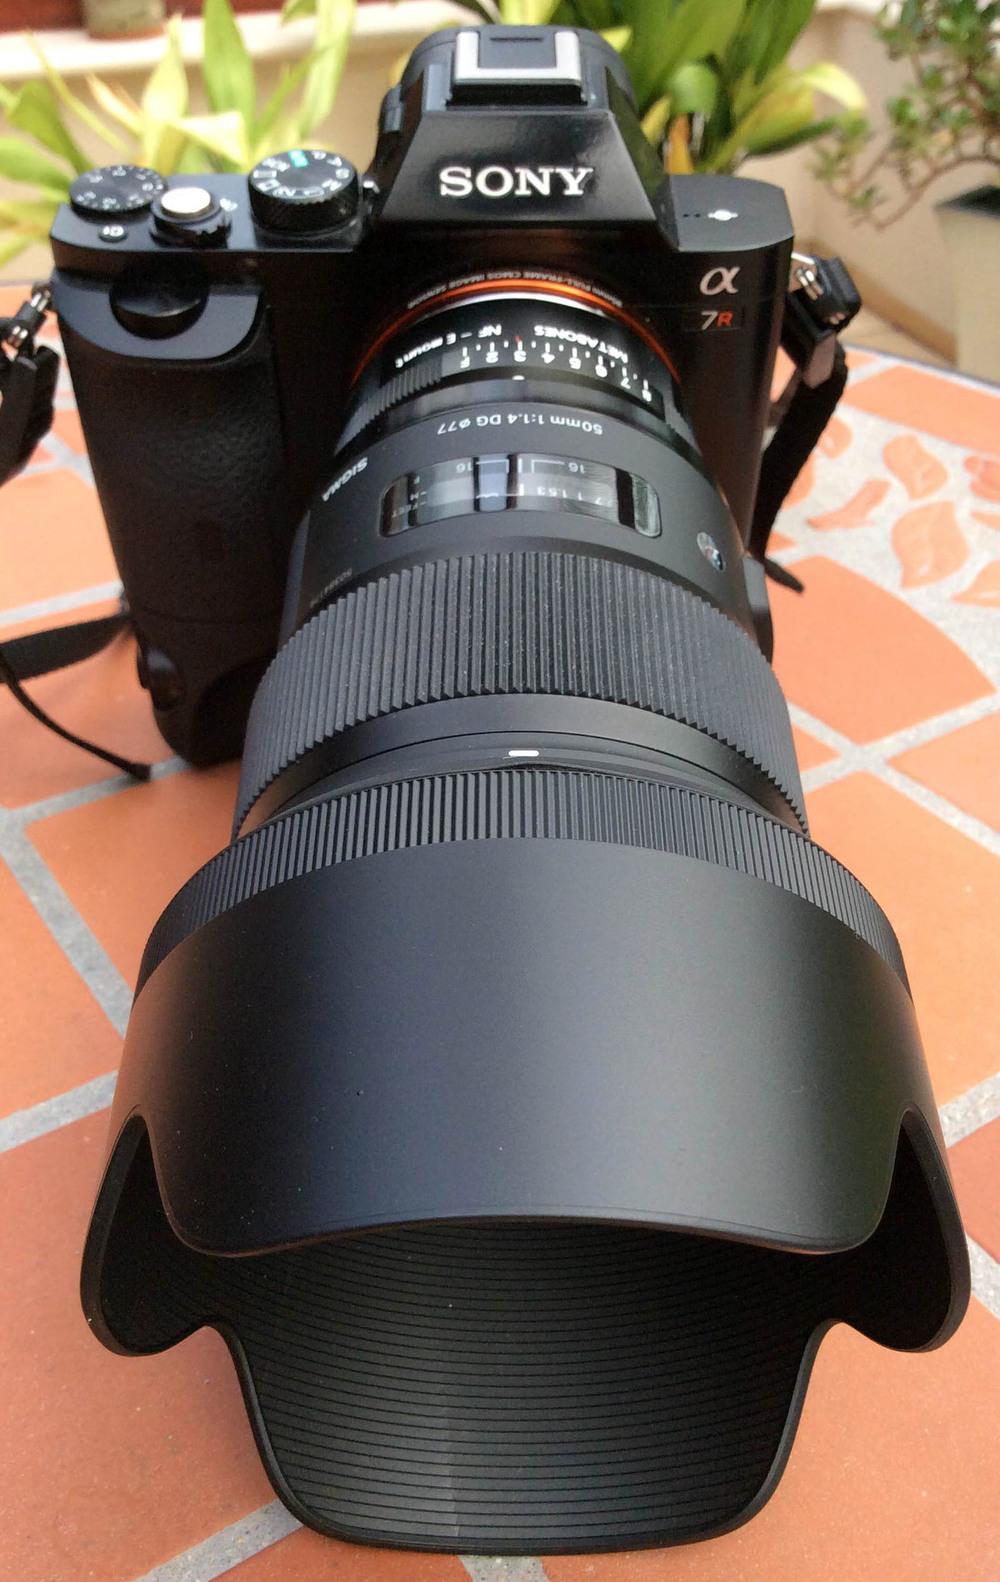 Sony  α7R E-mount Camera with Full Frame Sensor,  Sigma 50mm f1.4 DG HSM A - Nikon Fit, Metabones Nikon F > Sony e-mount adapter